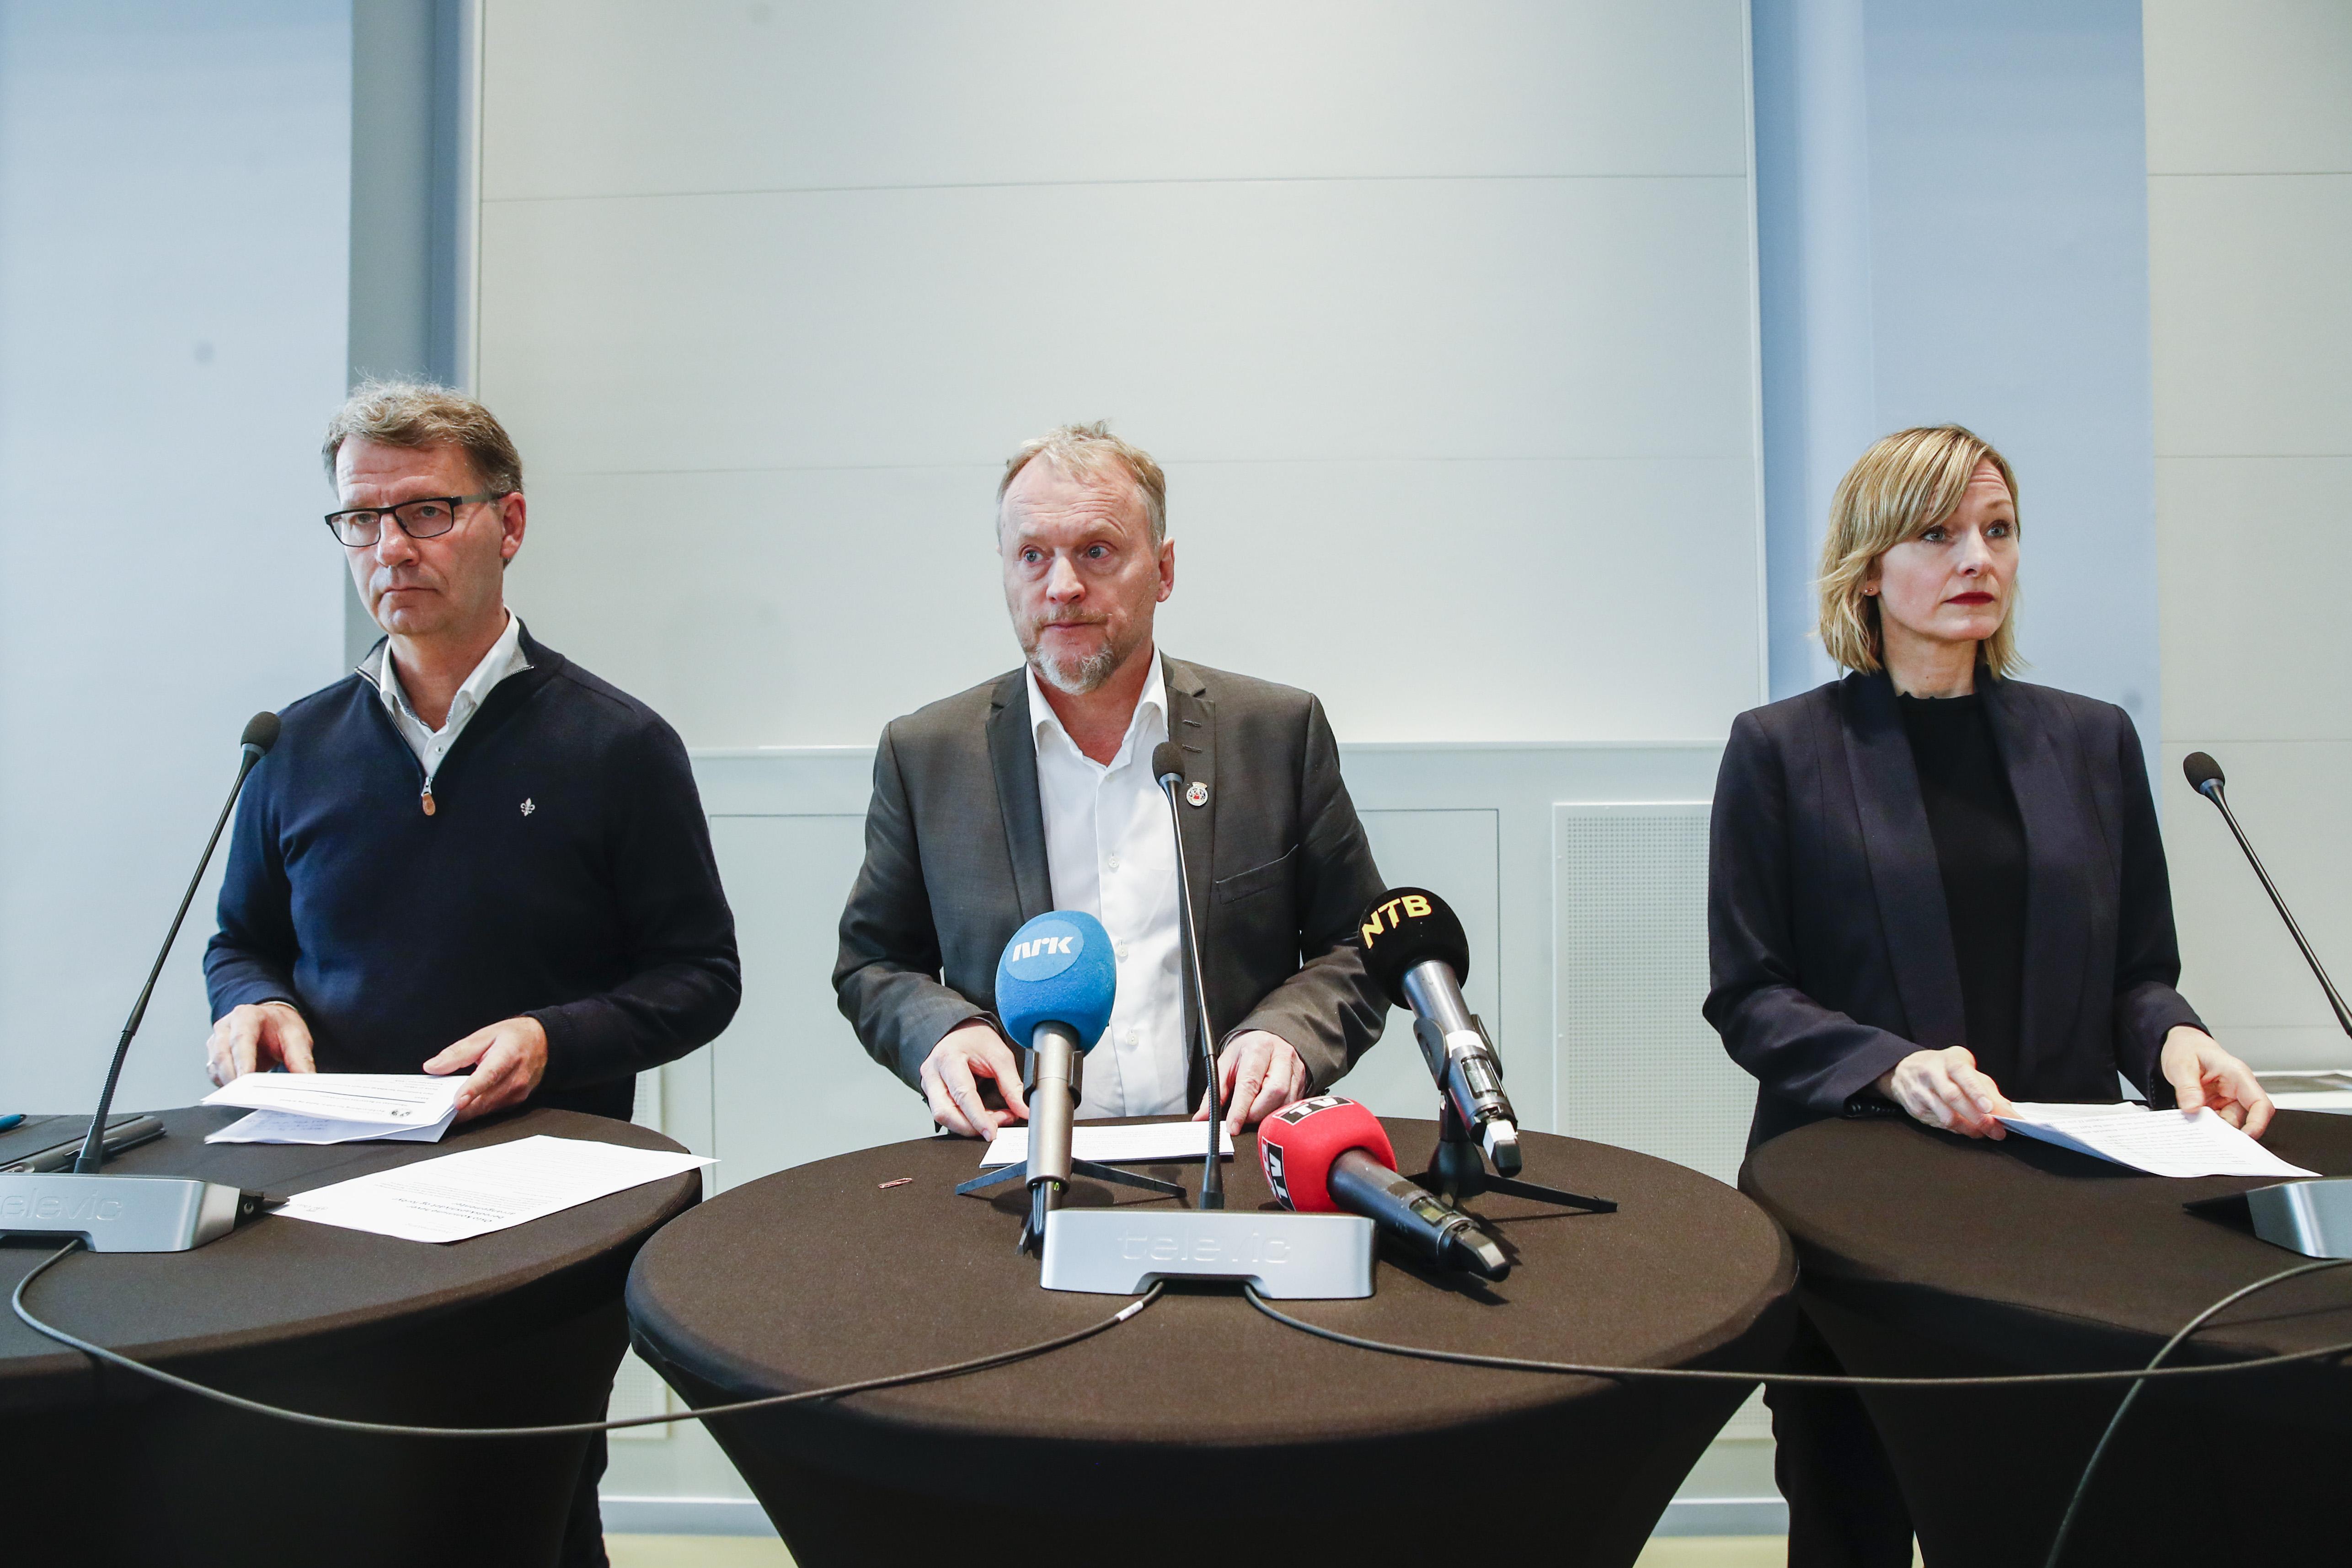 Robert Steen, Raymond Johansen og Inga Marte Thorkildsen, Foto: Scanpix